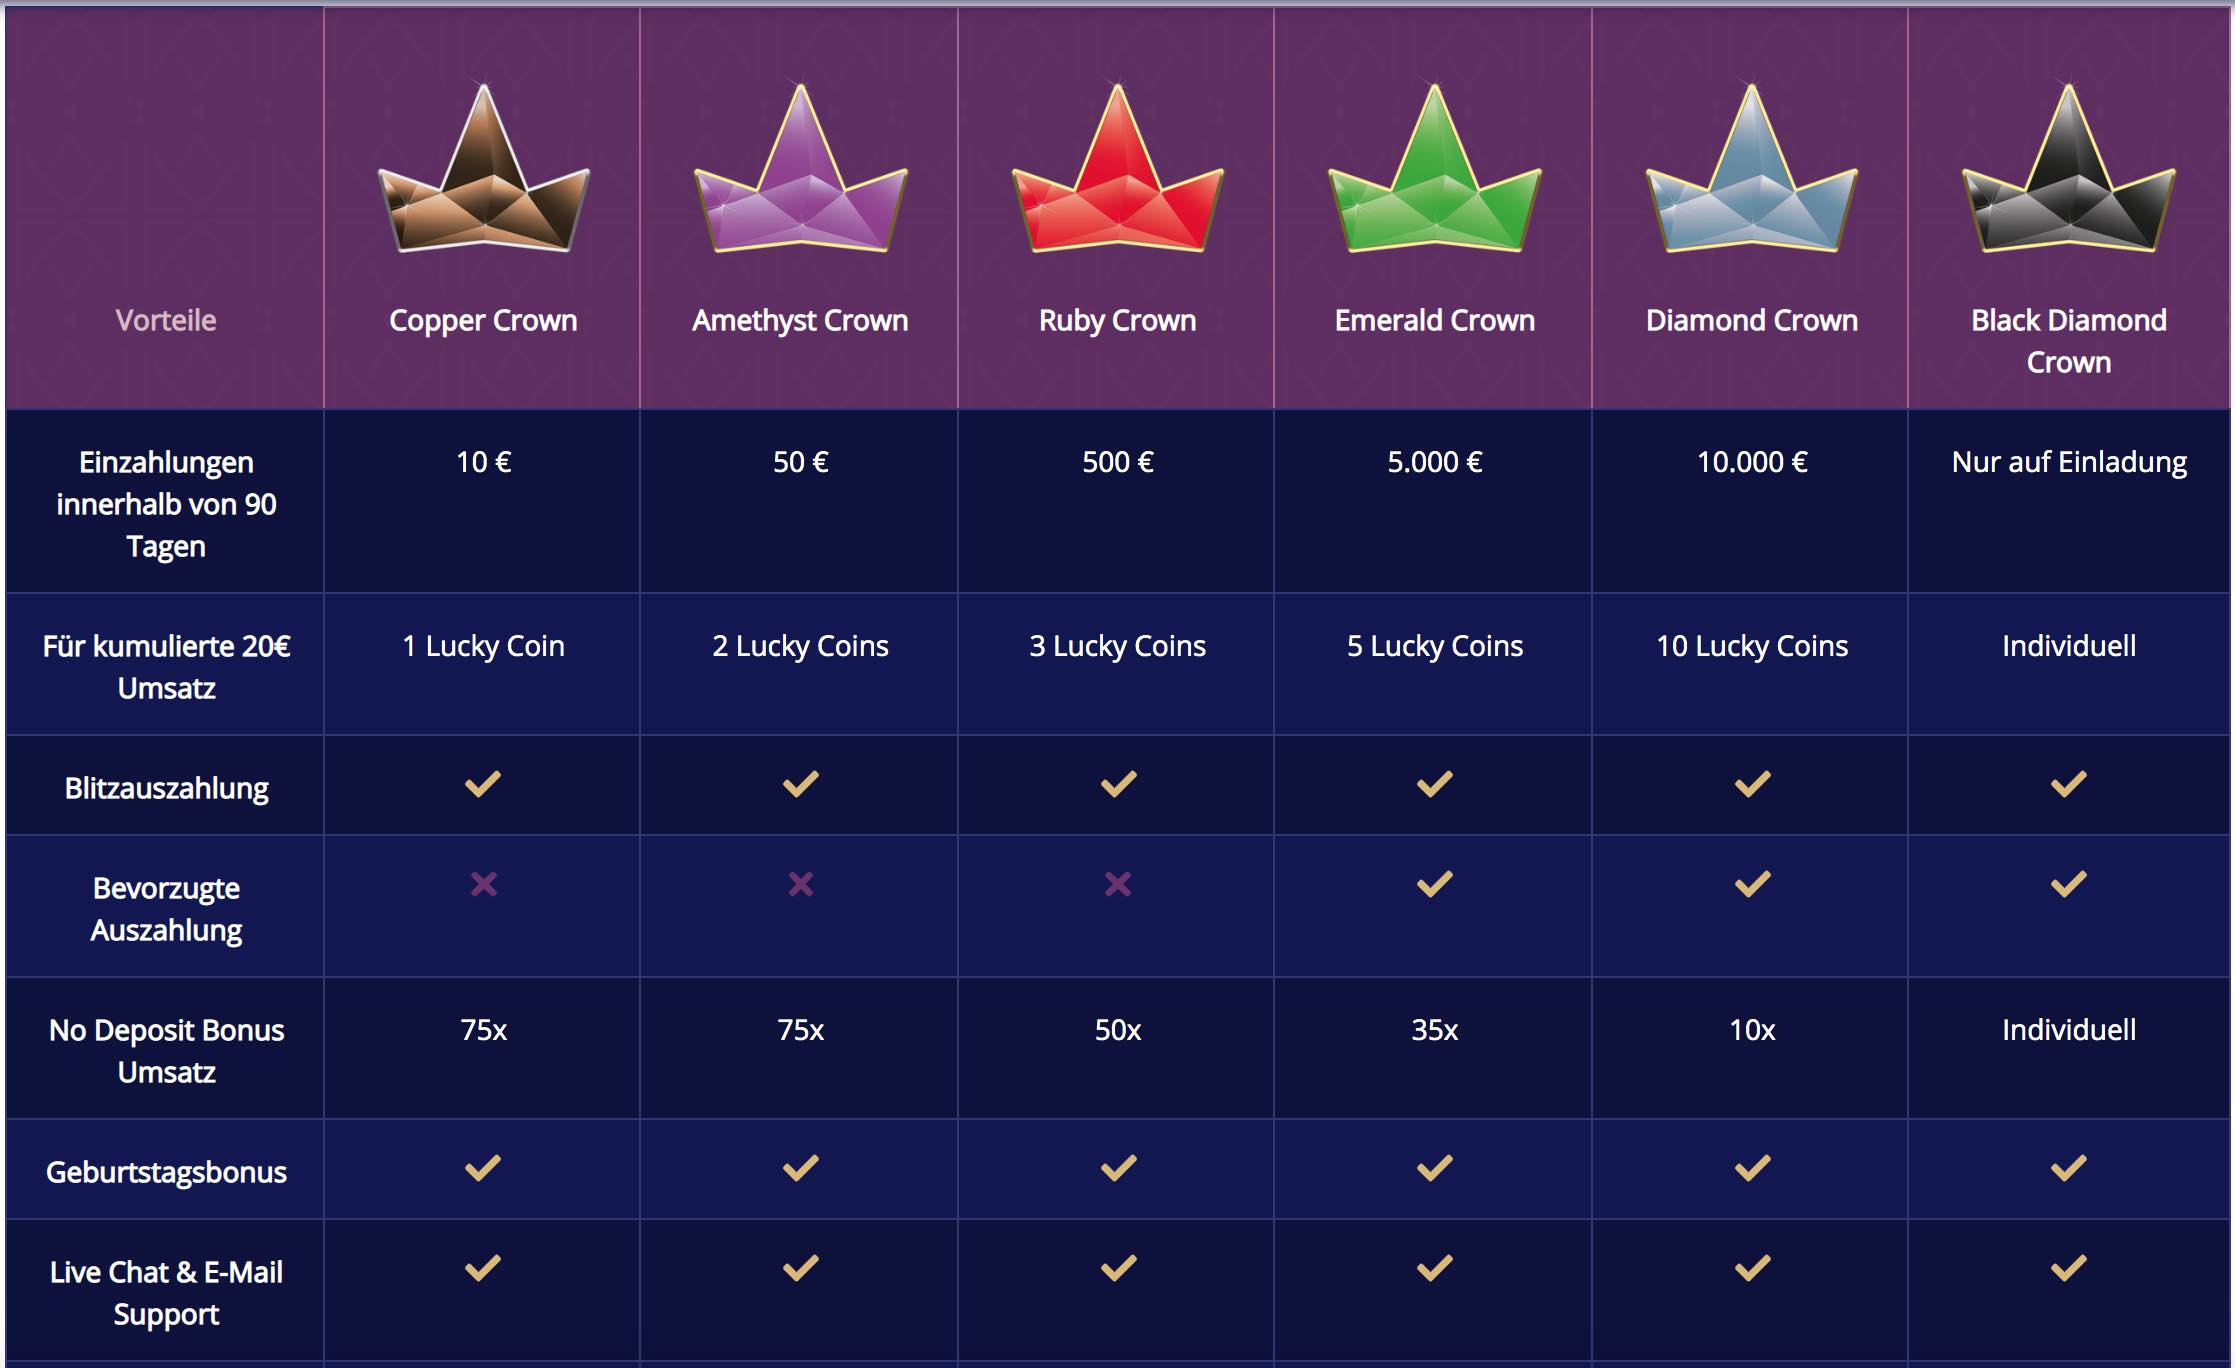 Royal Crown Club - VIP programm